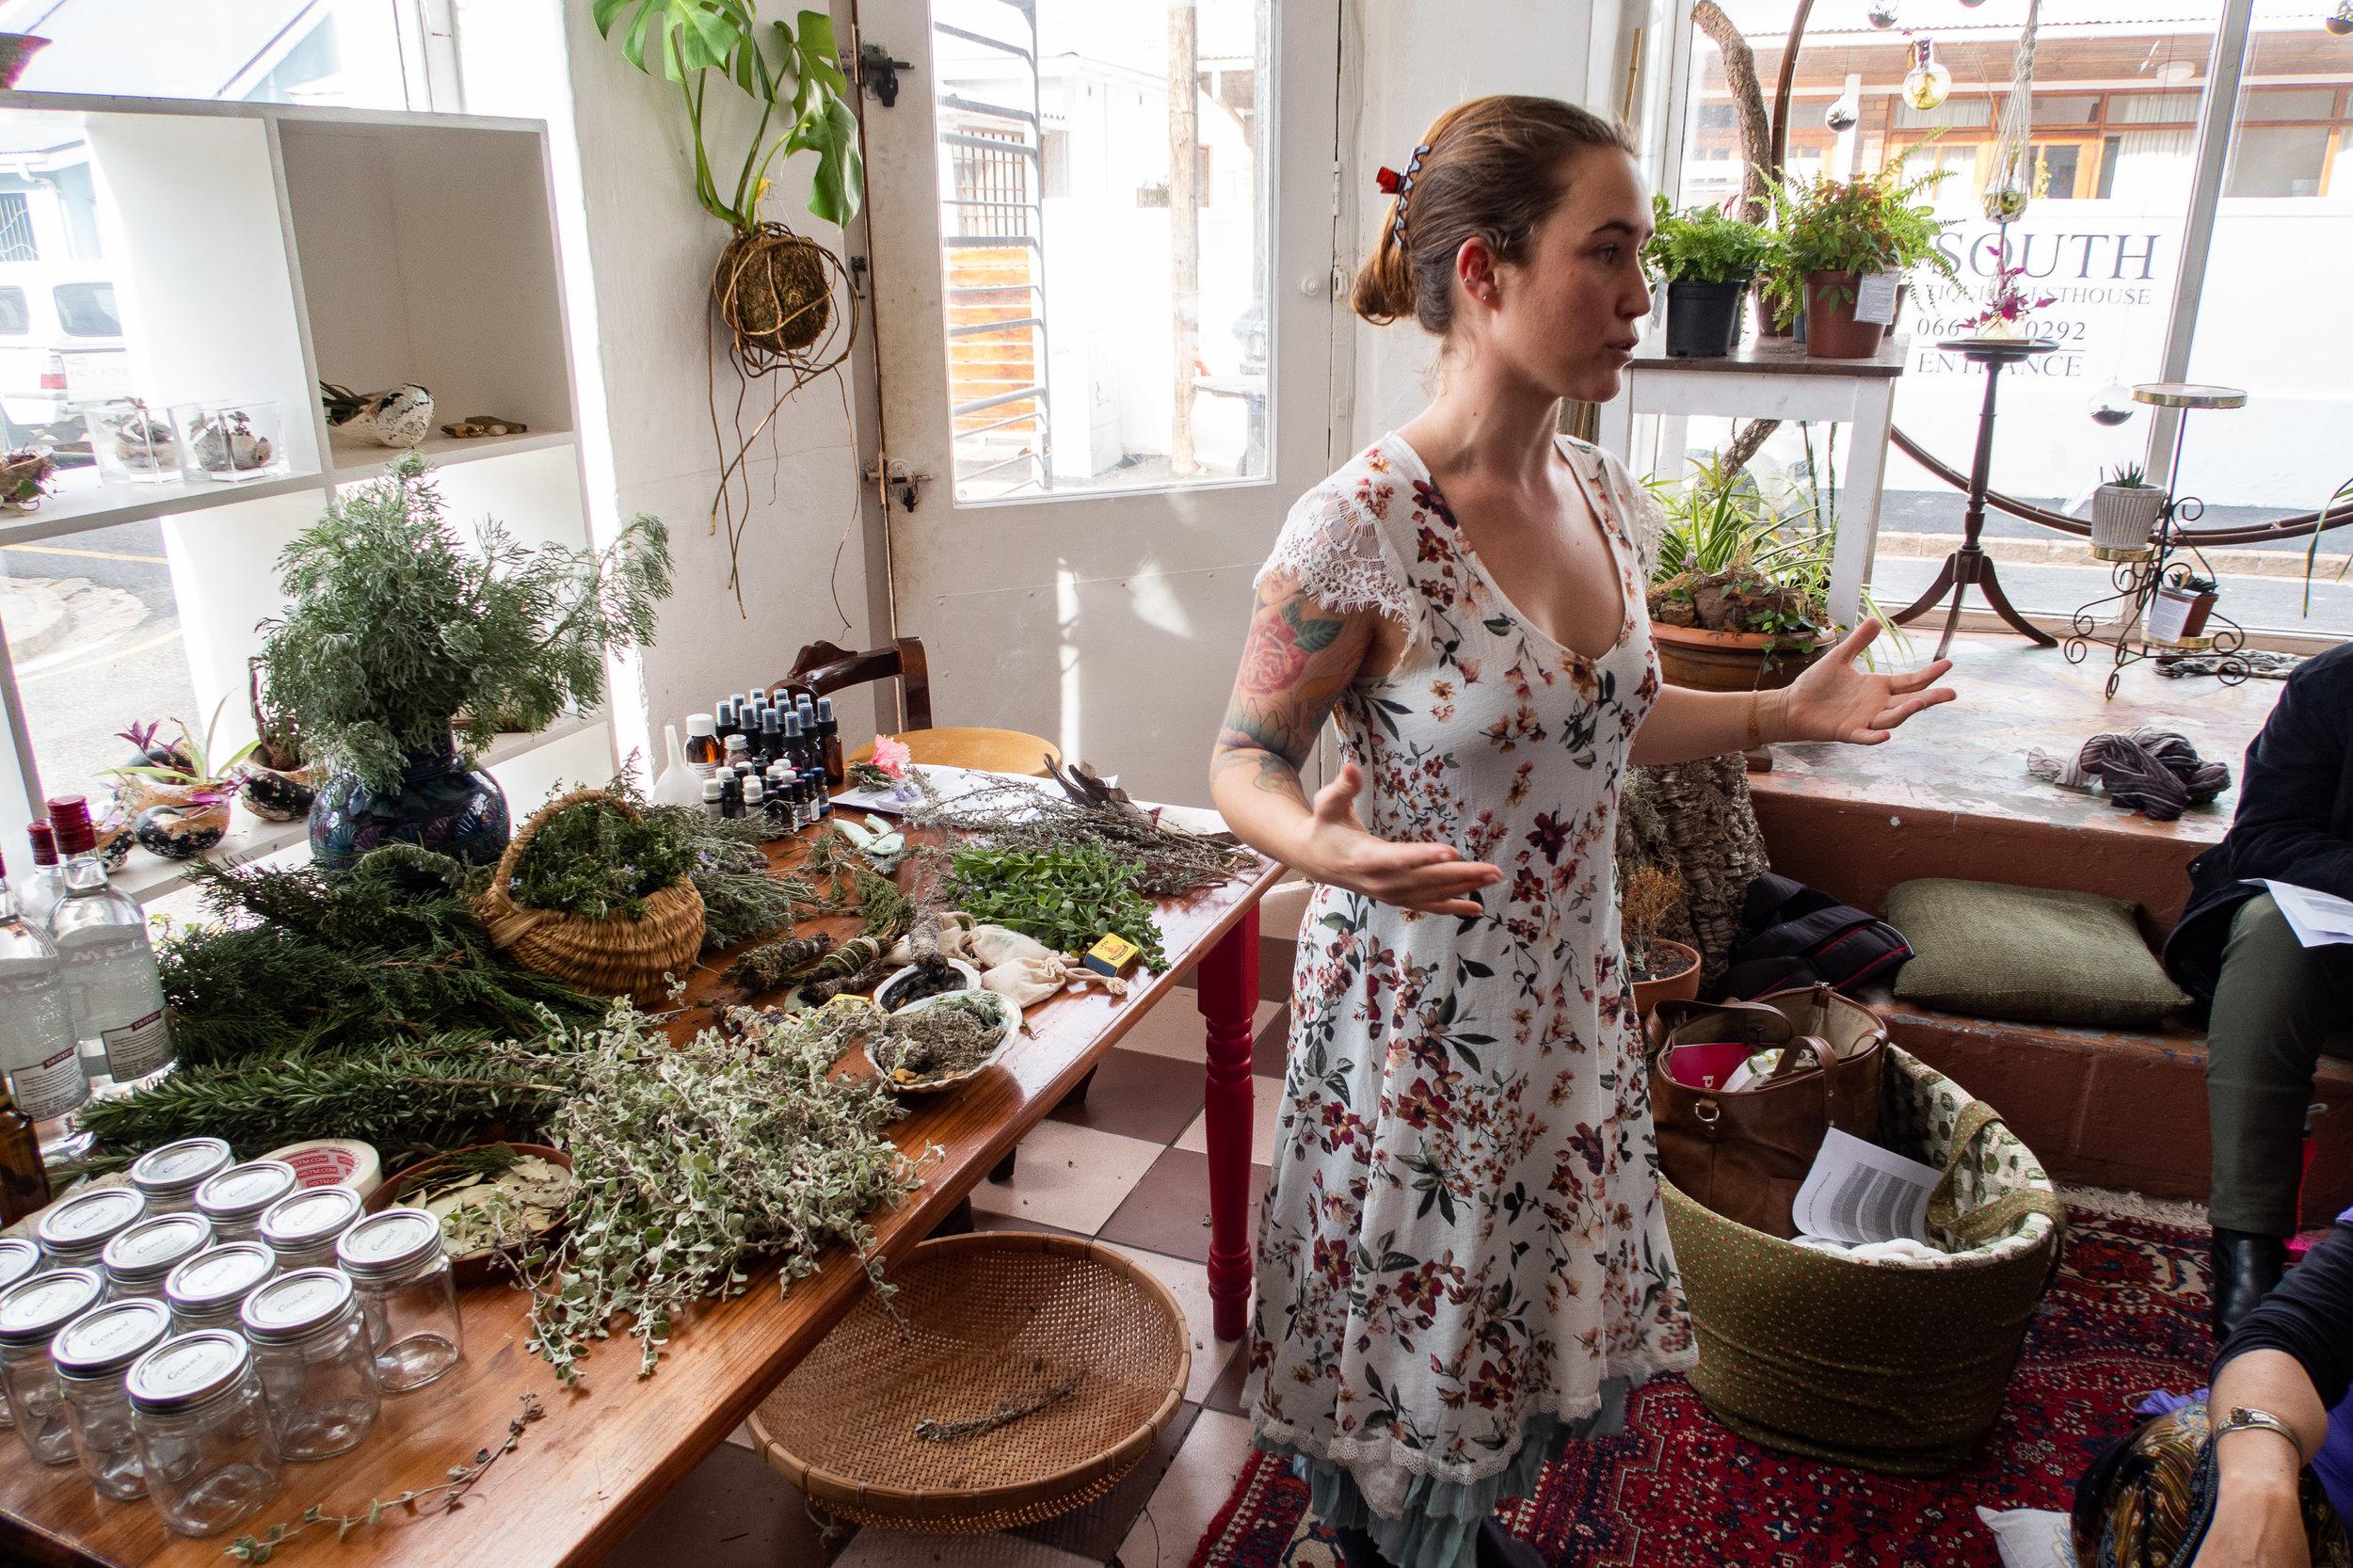 wild-love-herbalism-workshop-women-cape-town-south-africa-rewilding-019 2.JPG